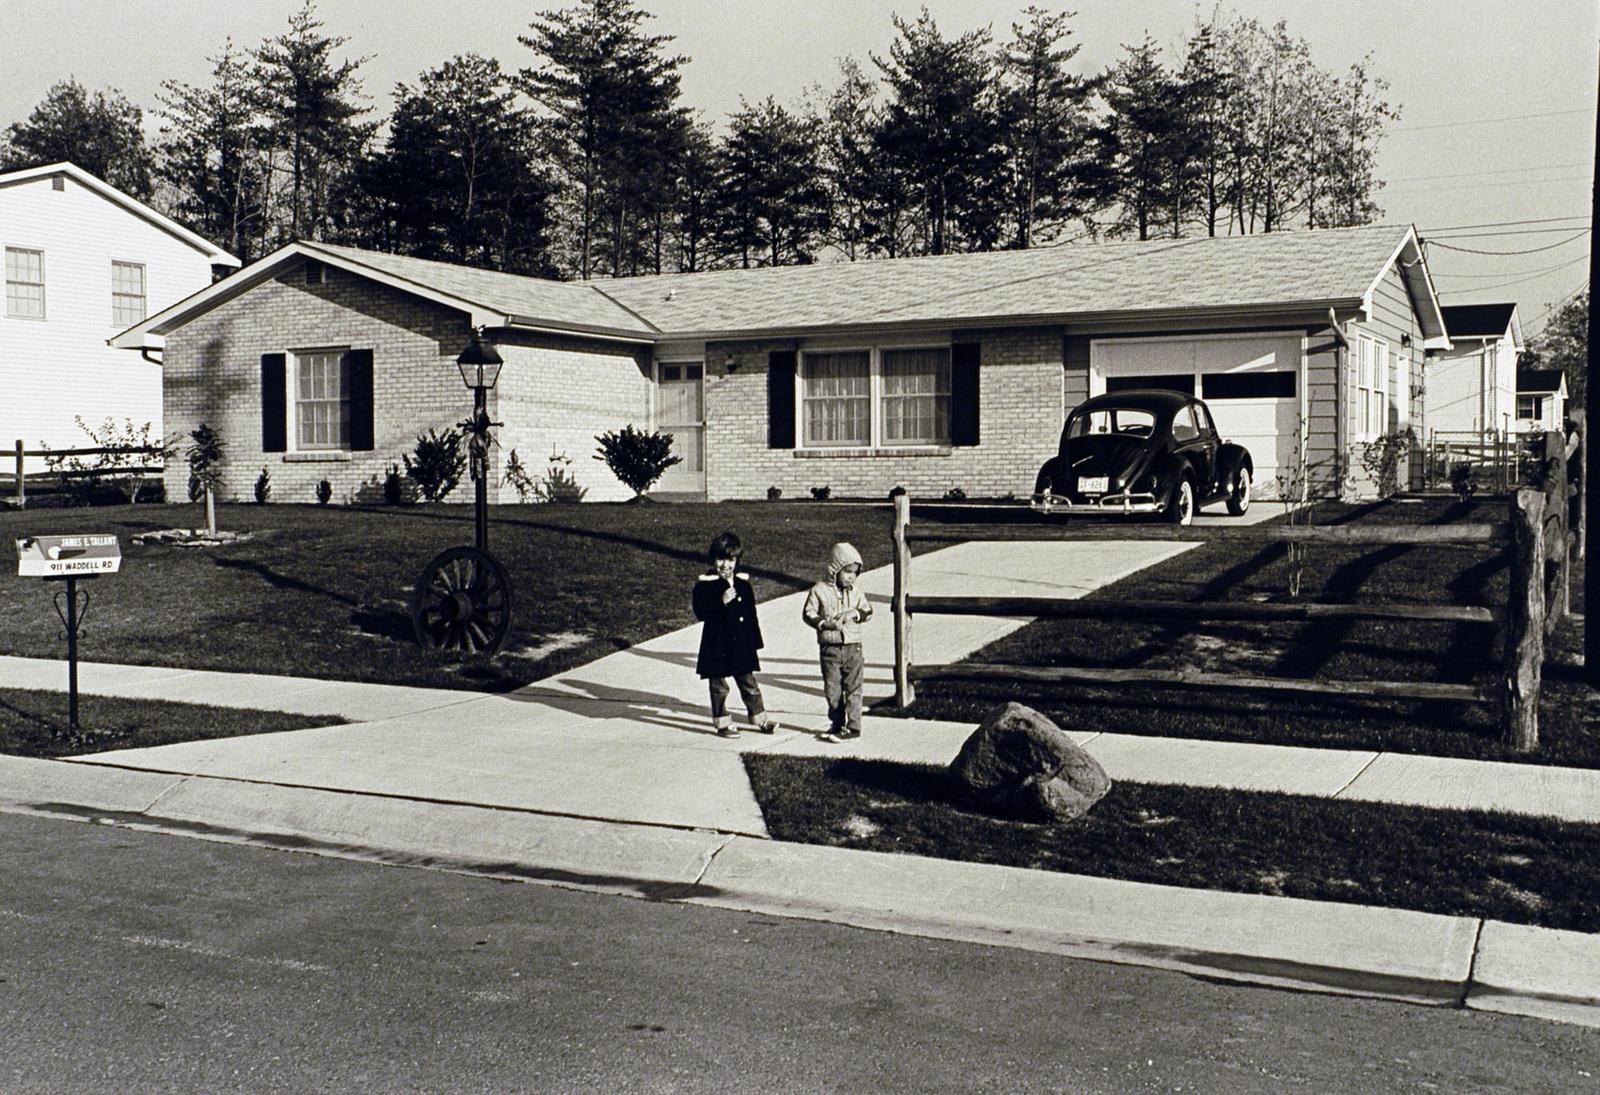 [Select views from across the U.S.]: Sample housing, neighborhoods, 1960's-1970's